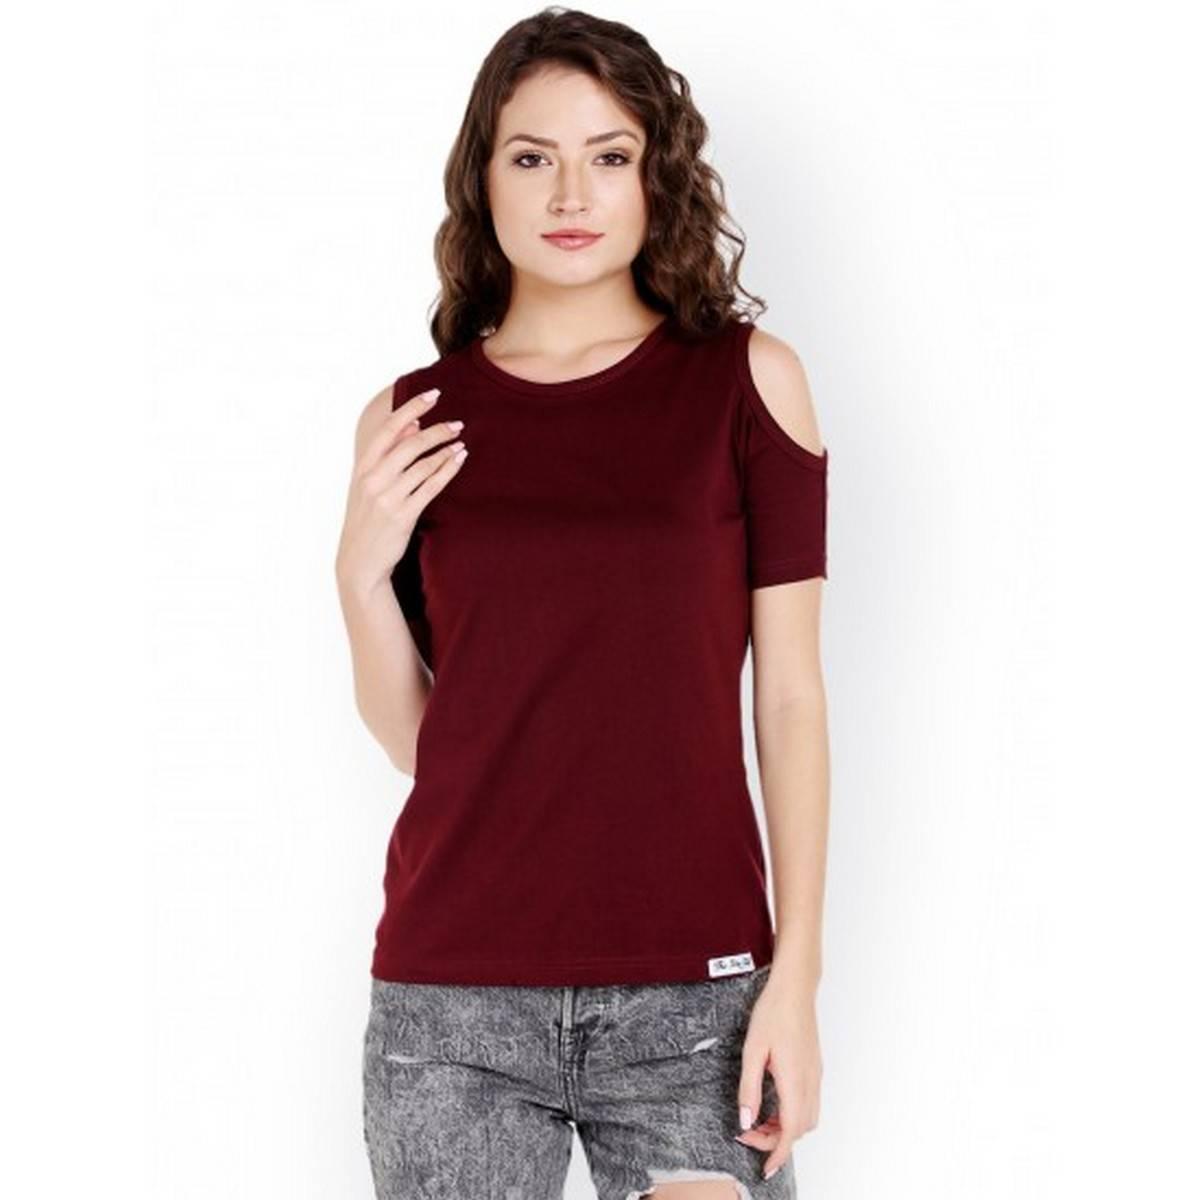 Half Sleeves Cold Shoulder t shirt for girls (Maroon)